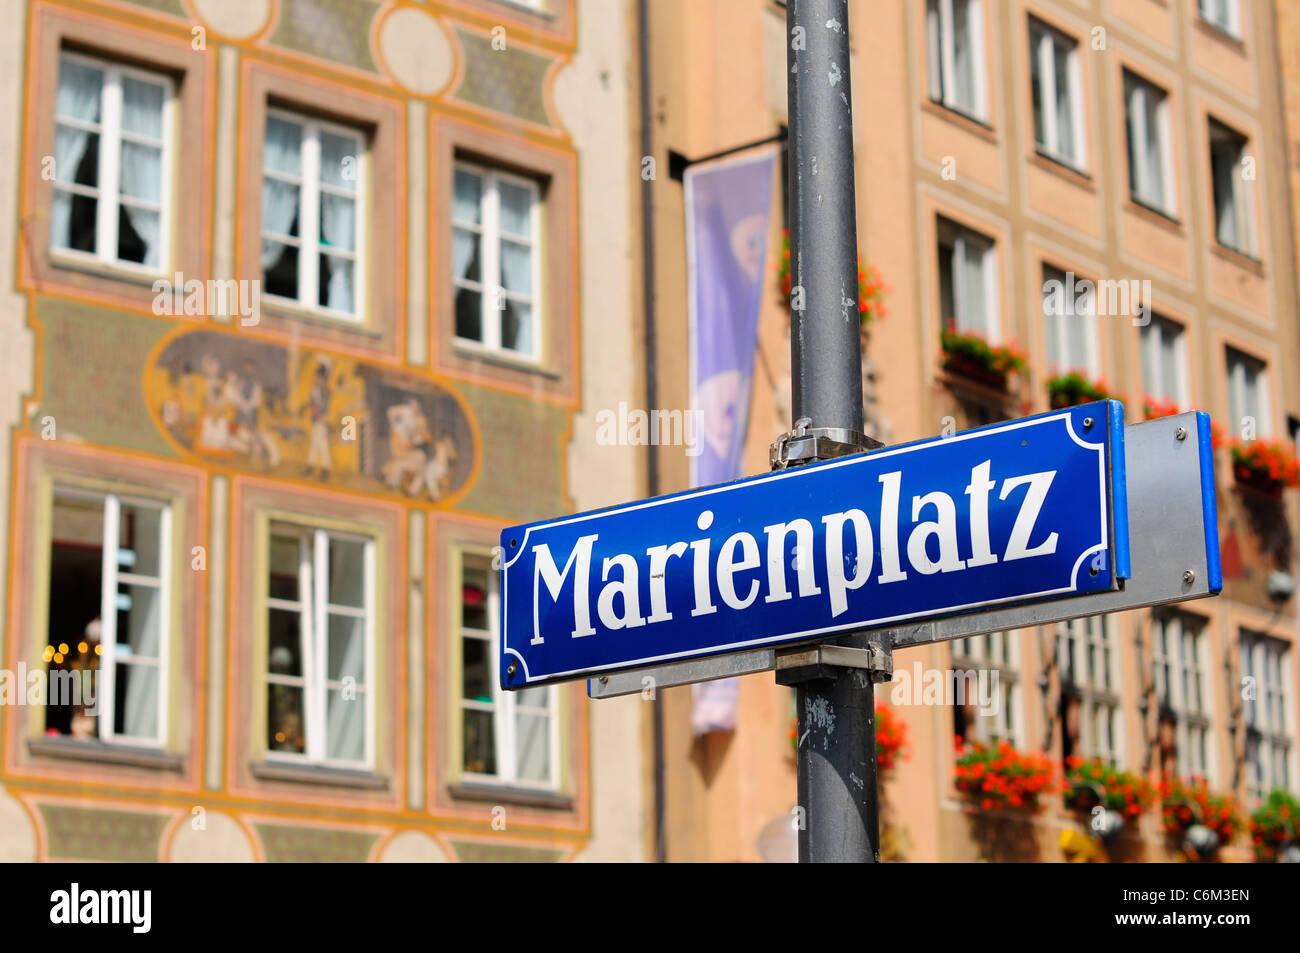 La plaza Marienplatz, Munich, Alemania Imagen De Stock